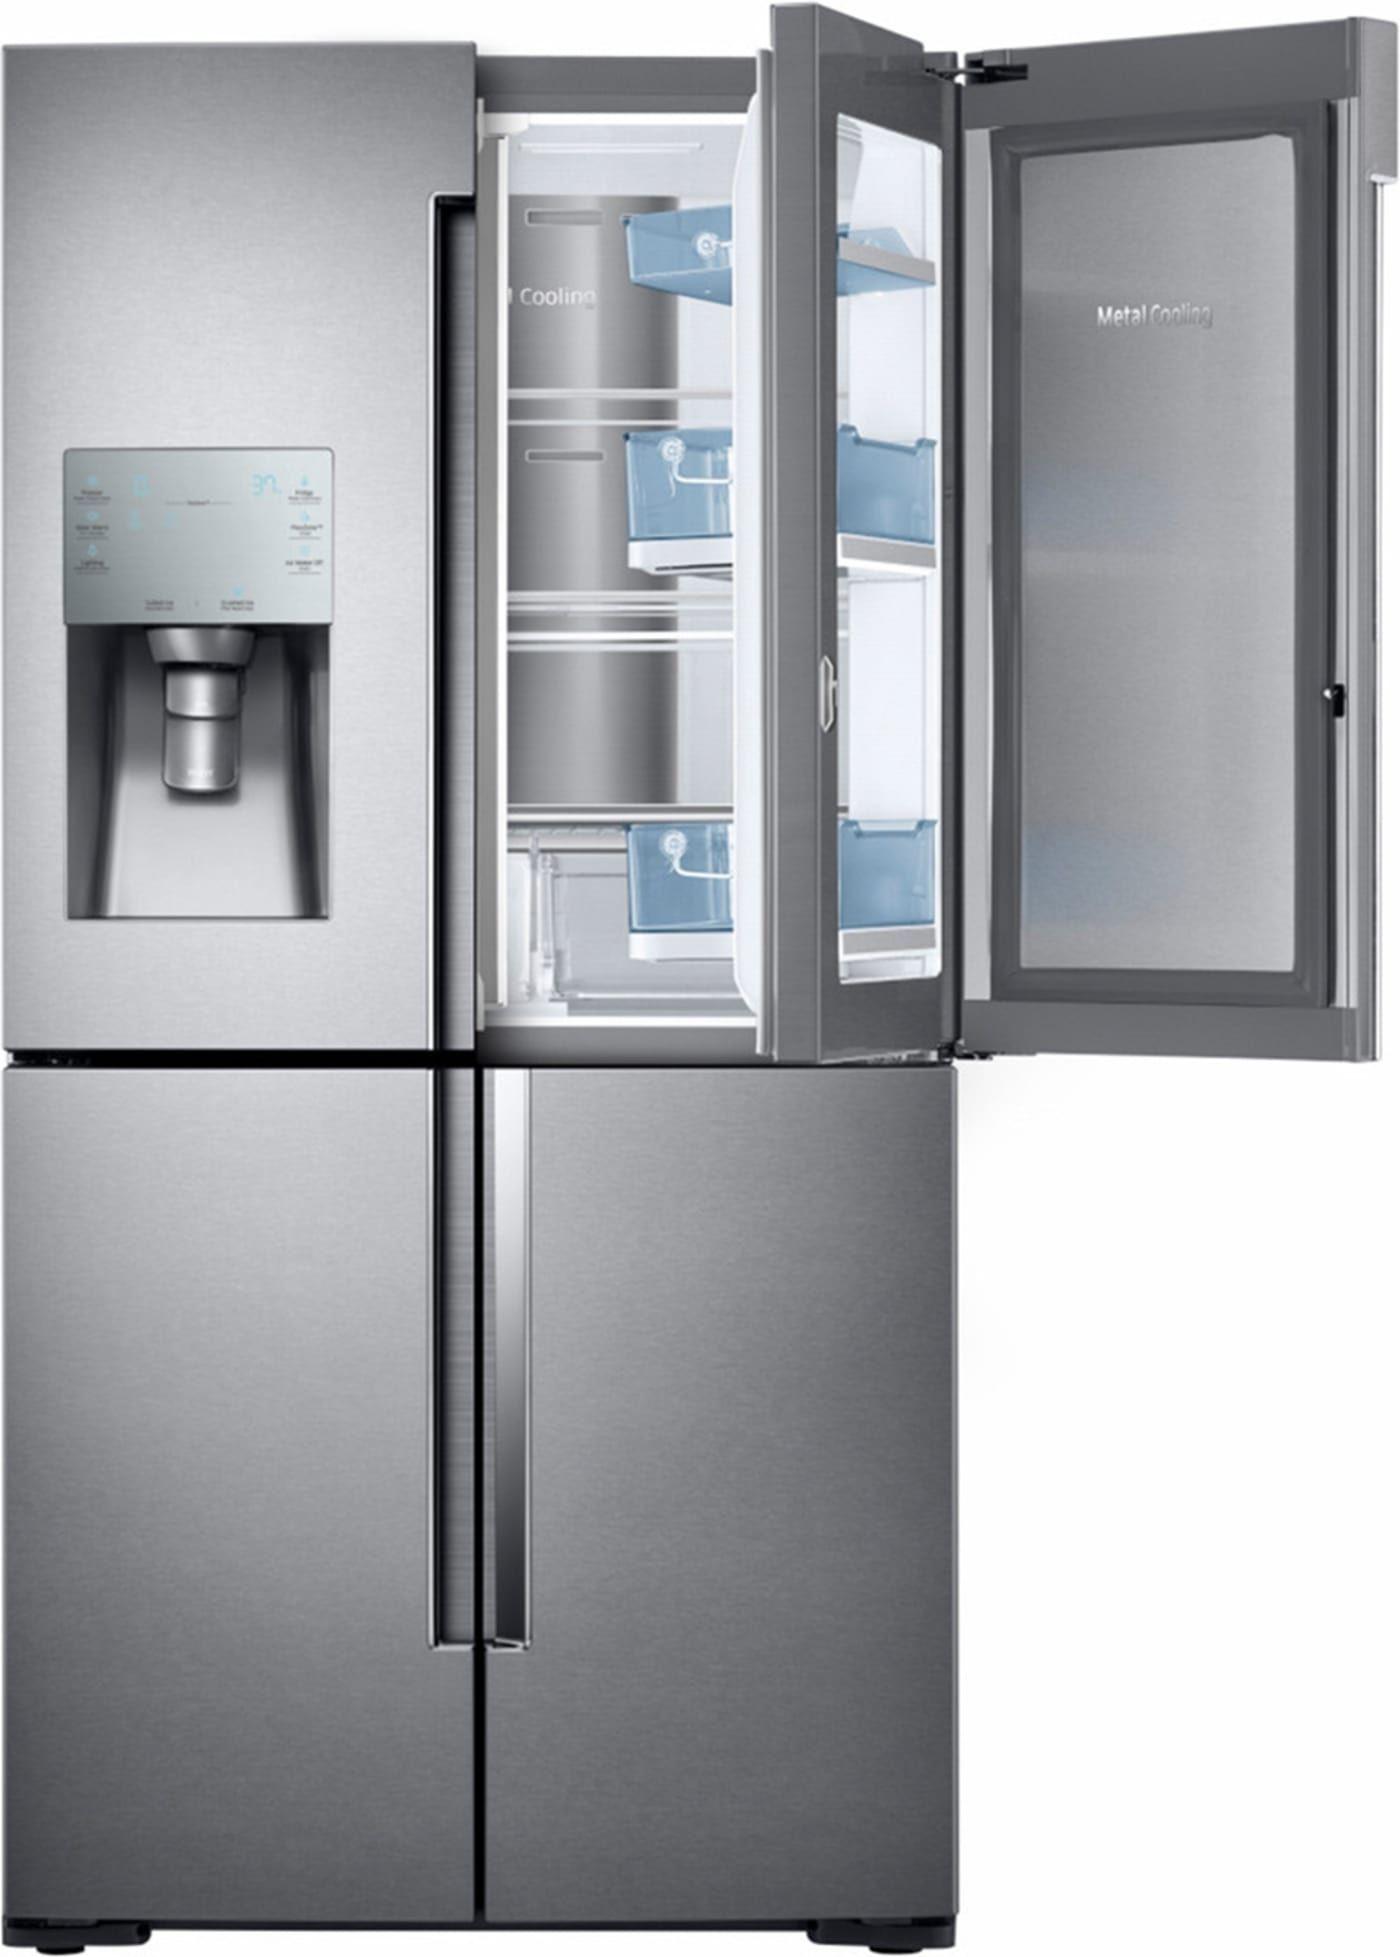 Samsung Rf28k9380sr Samsung French Door French Door Refrigerator Counter Depth Refrigerator